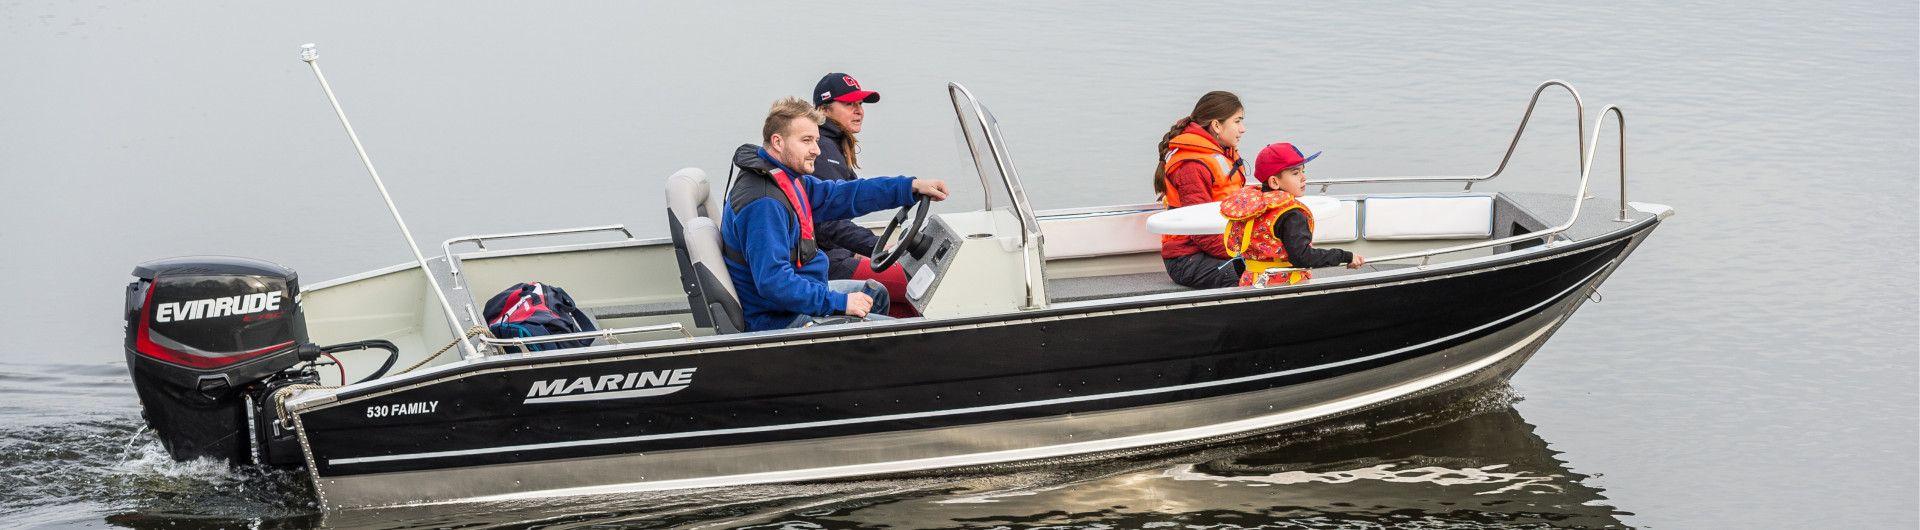 Aluminiumboot Marine 530 Family Header